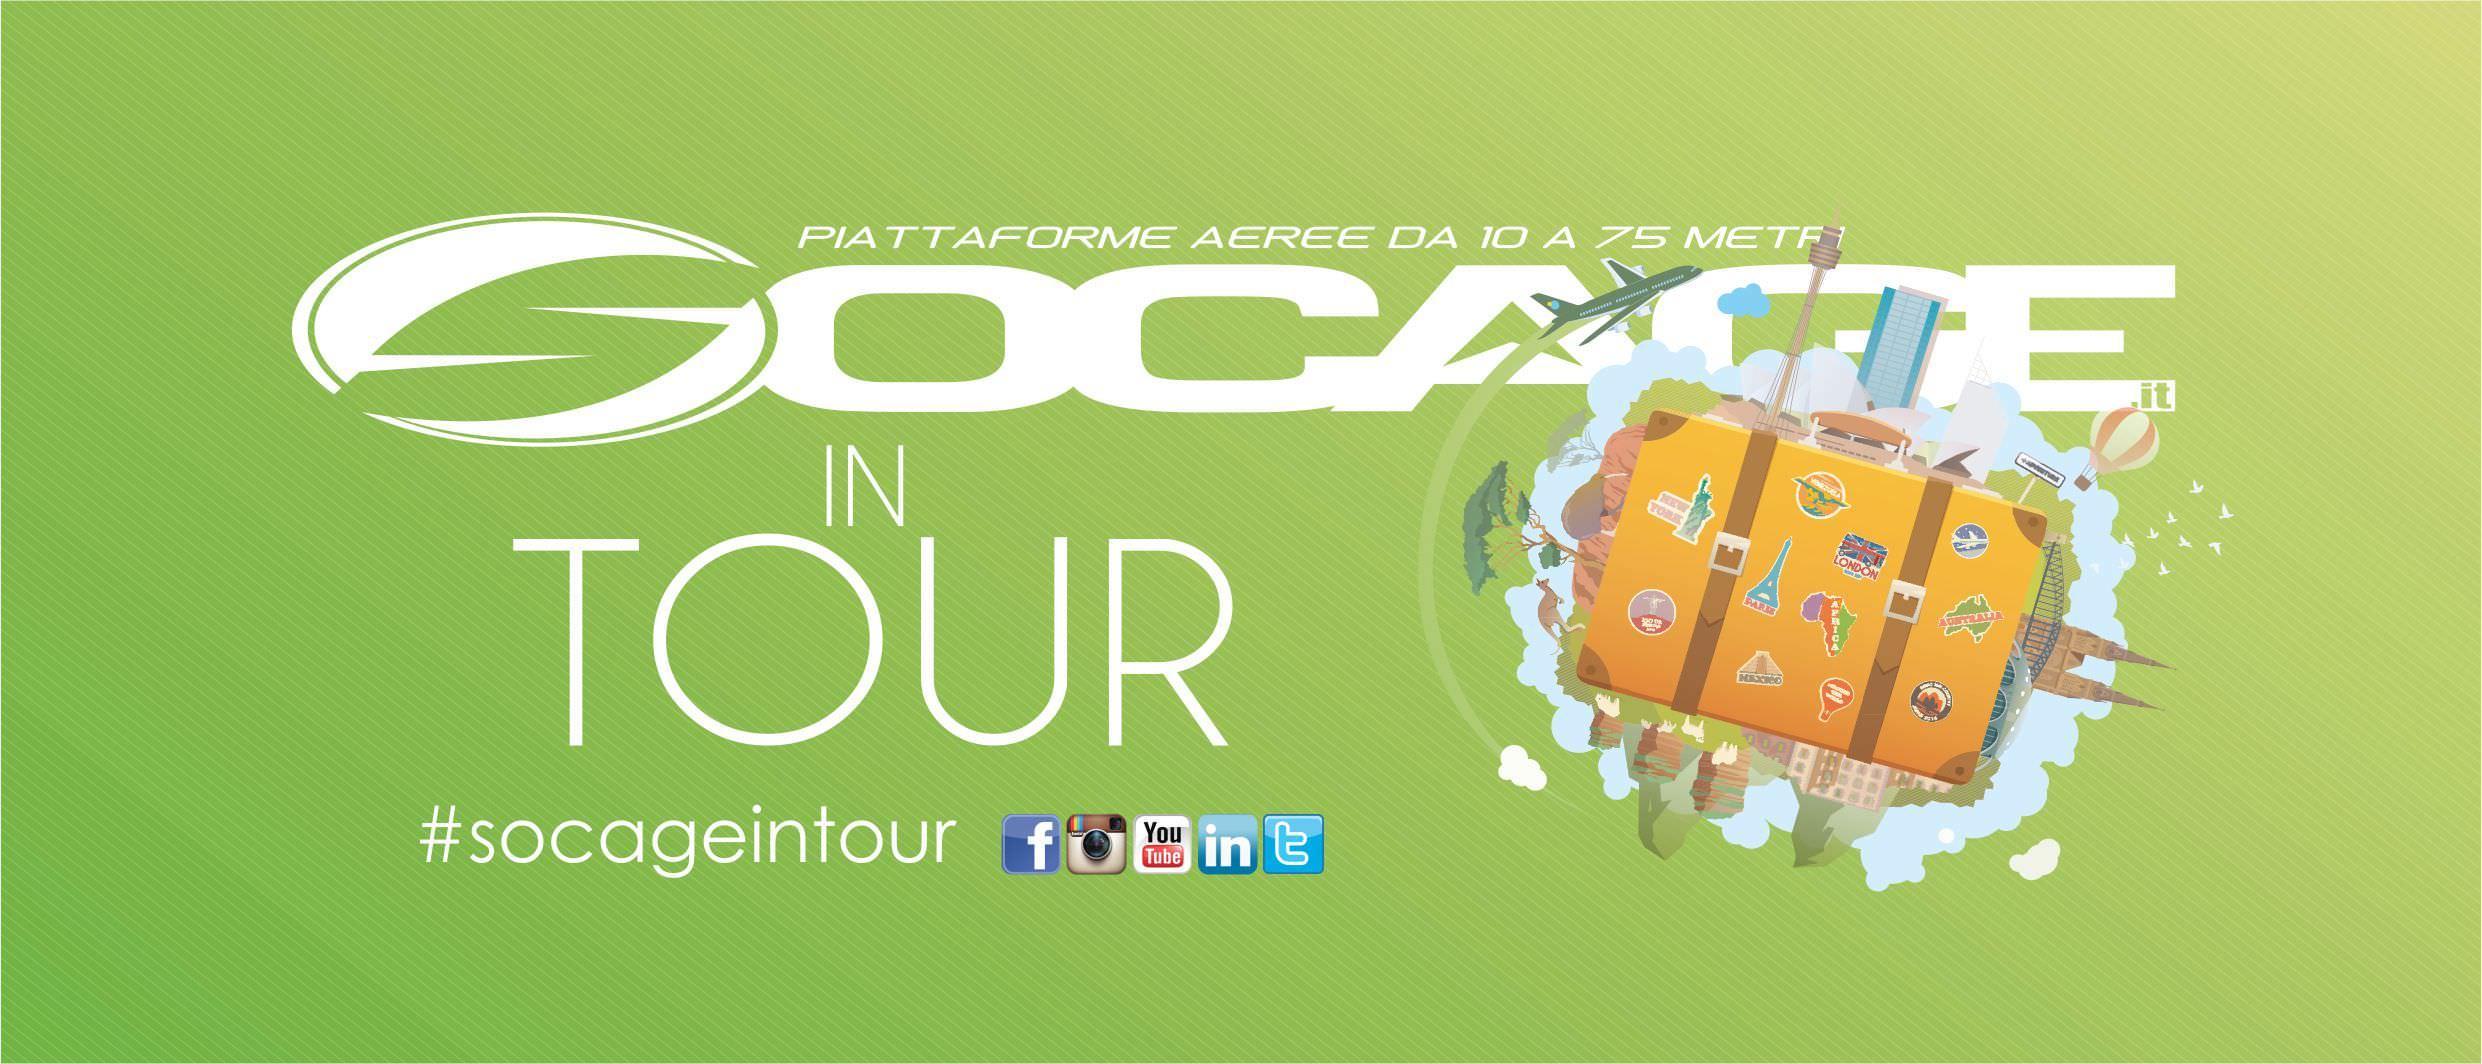 Socgae in tour 2017 banner